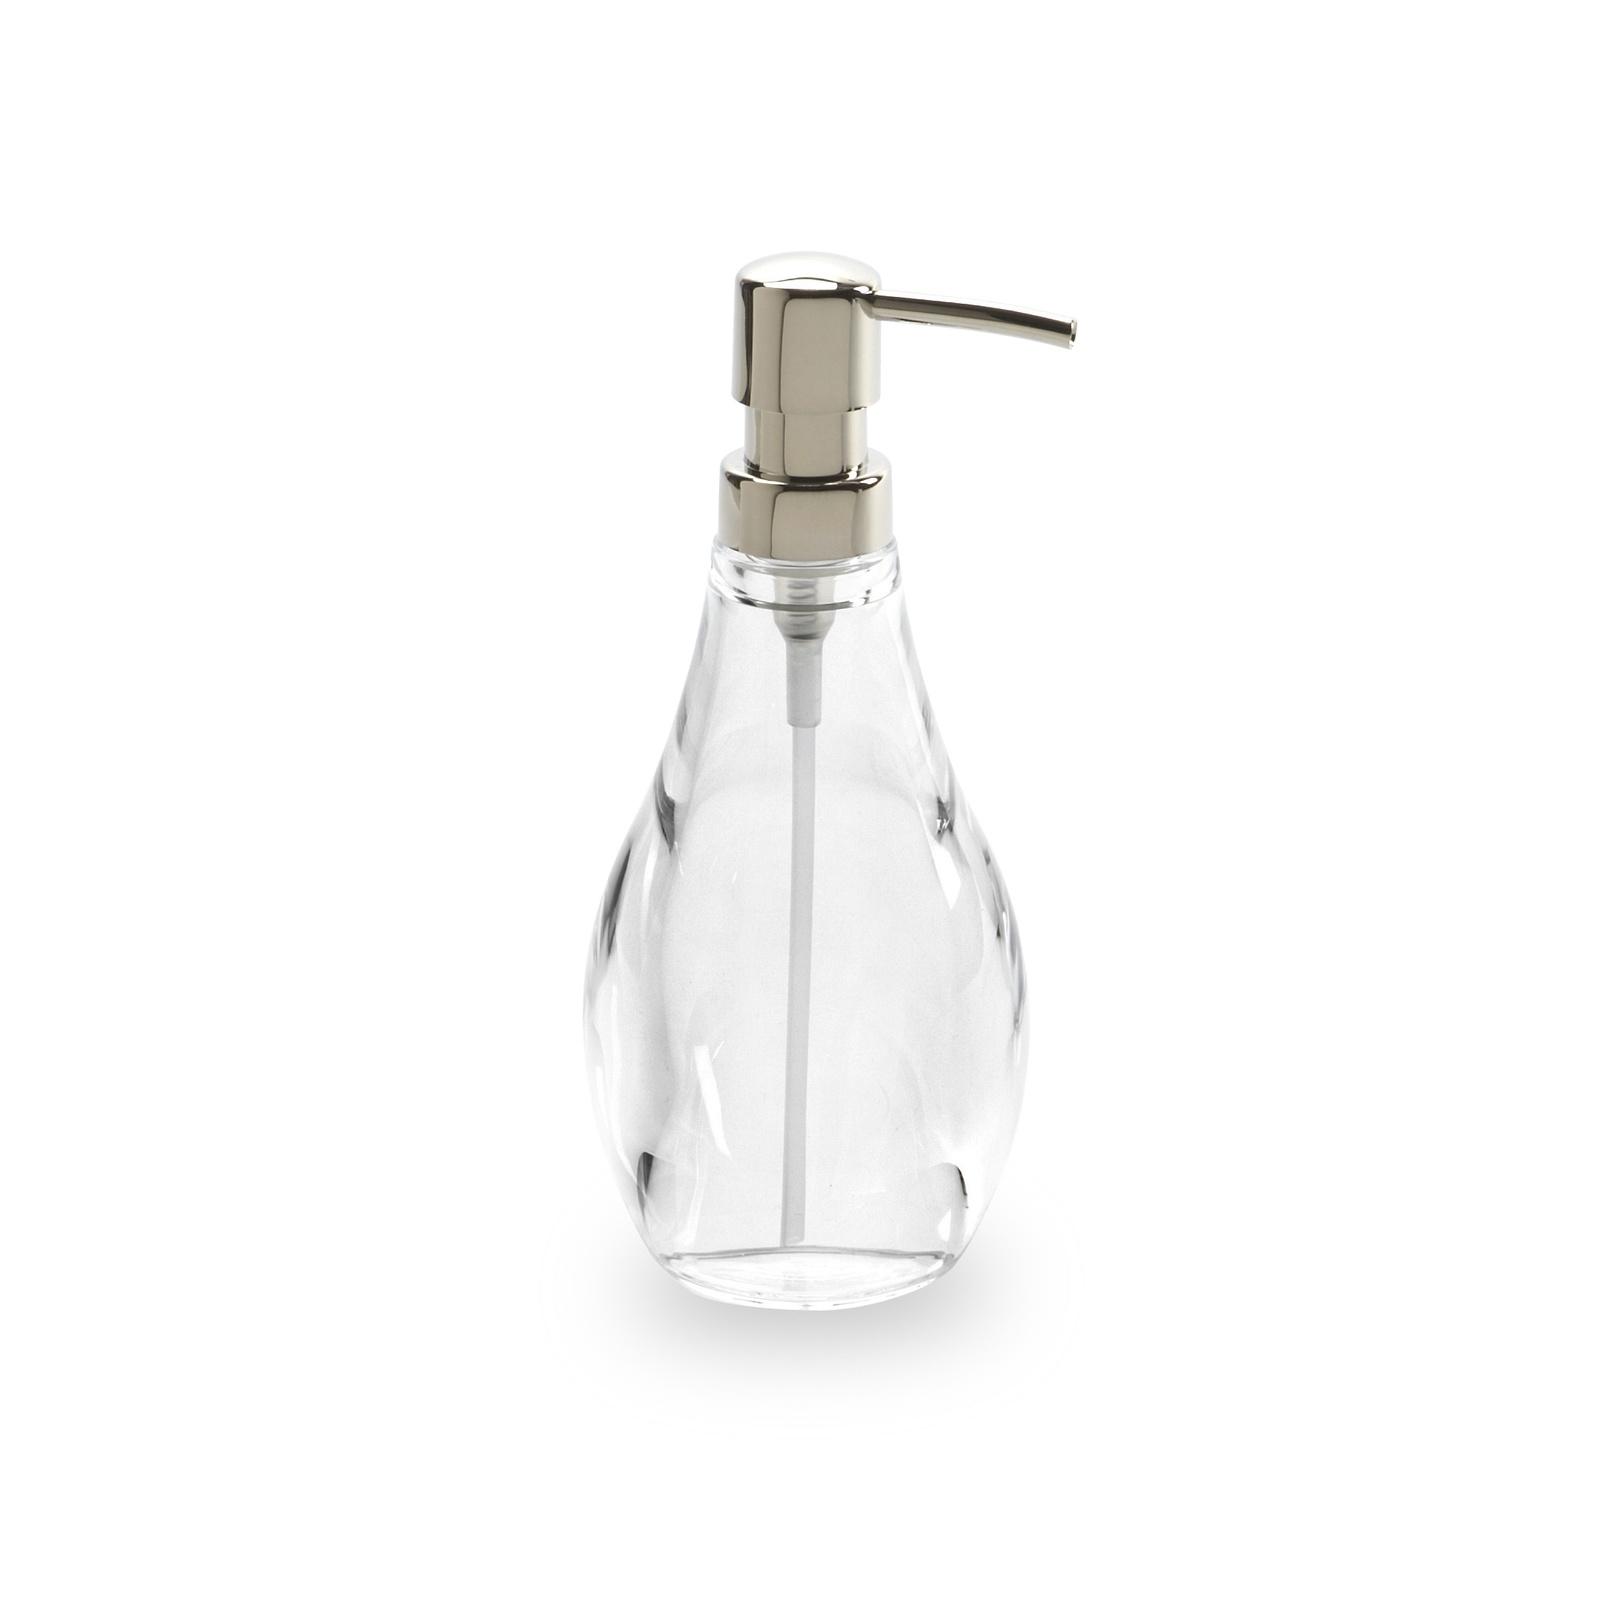 "Диспенсер для мыла Umbra ""Droplet"", цвет: прозрачный, 19 х 9 х 9 см"